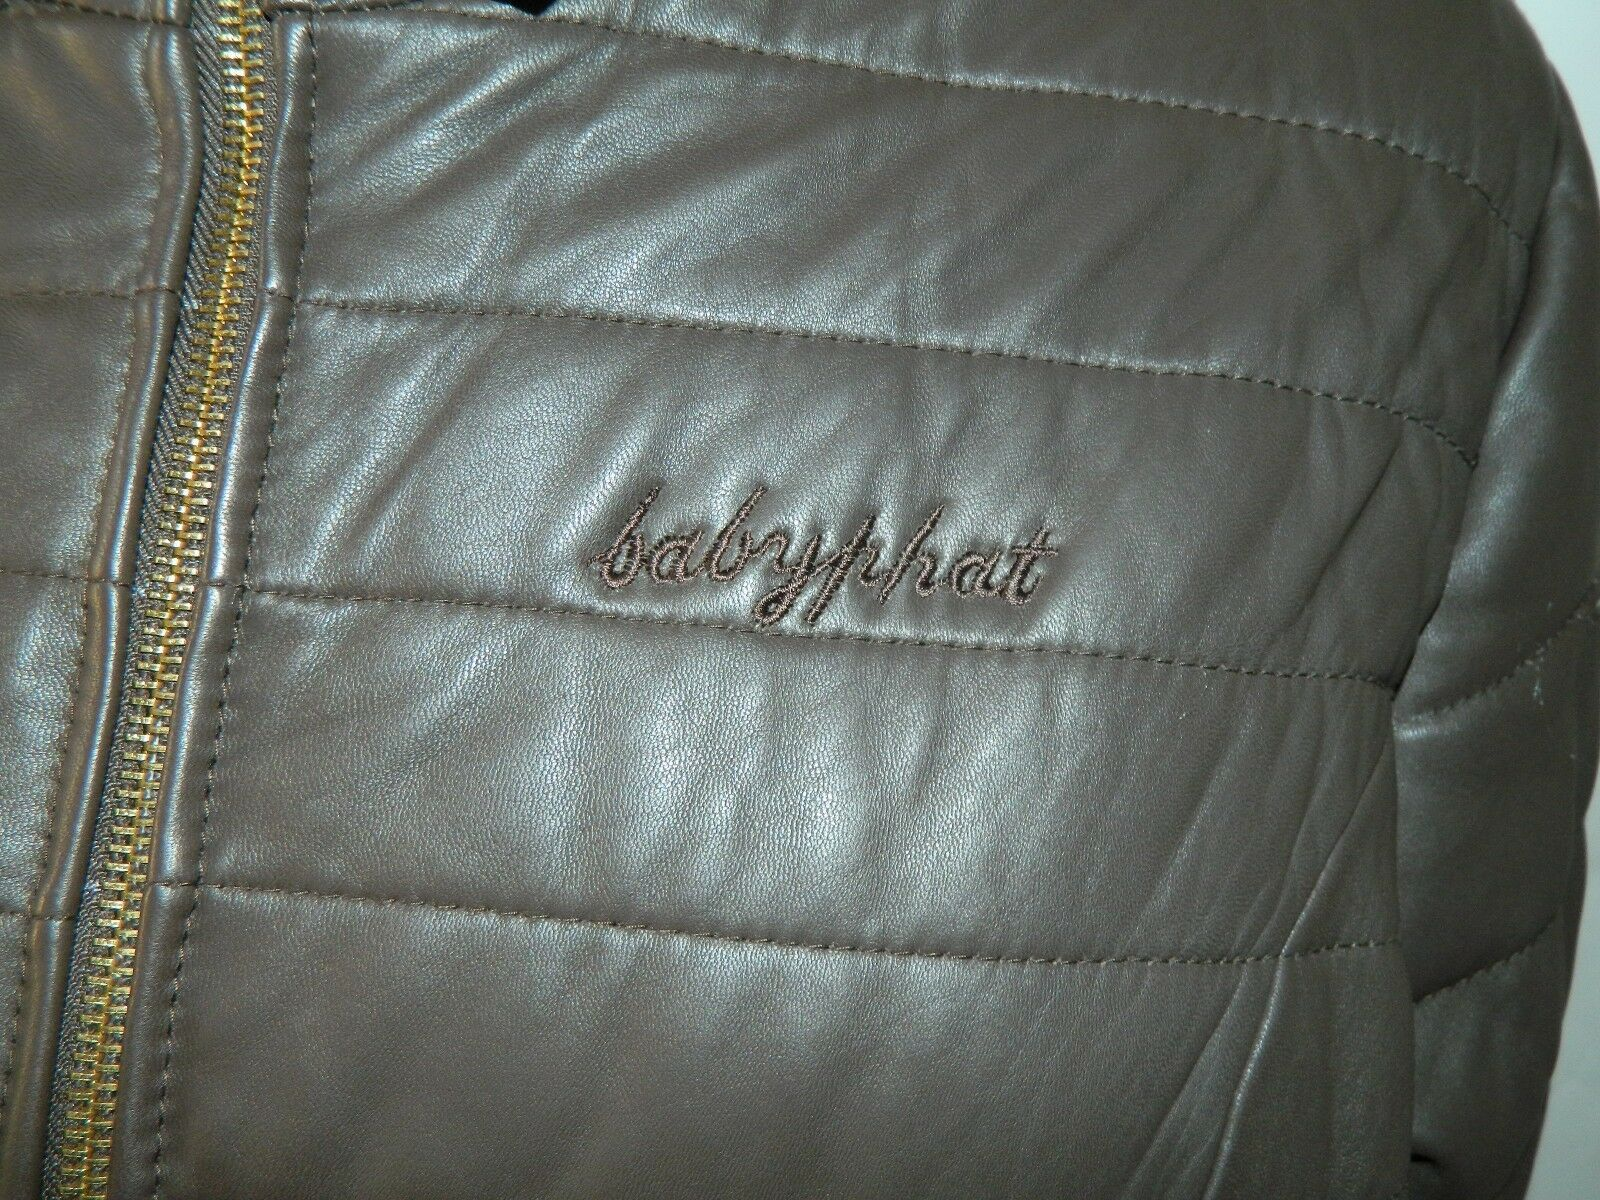 BABY PHAT Jacket Puffer Leather Kimora Lee Simmons Brown Coat XX-Large image 3